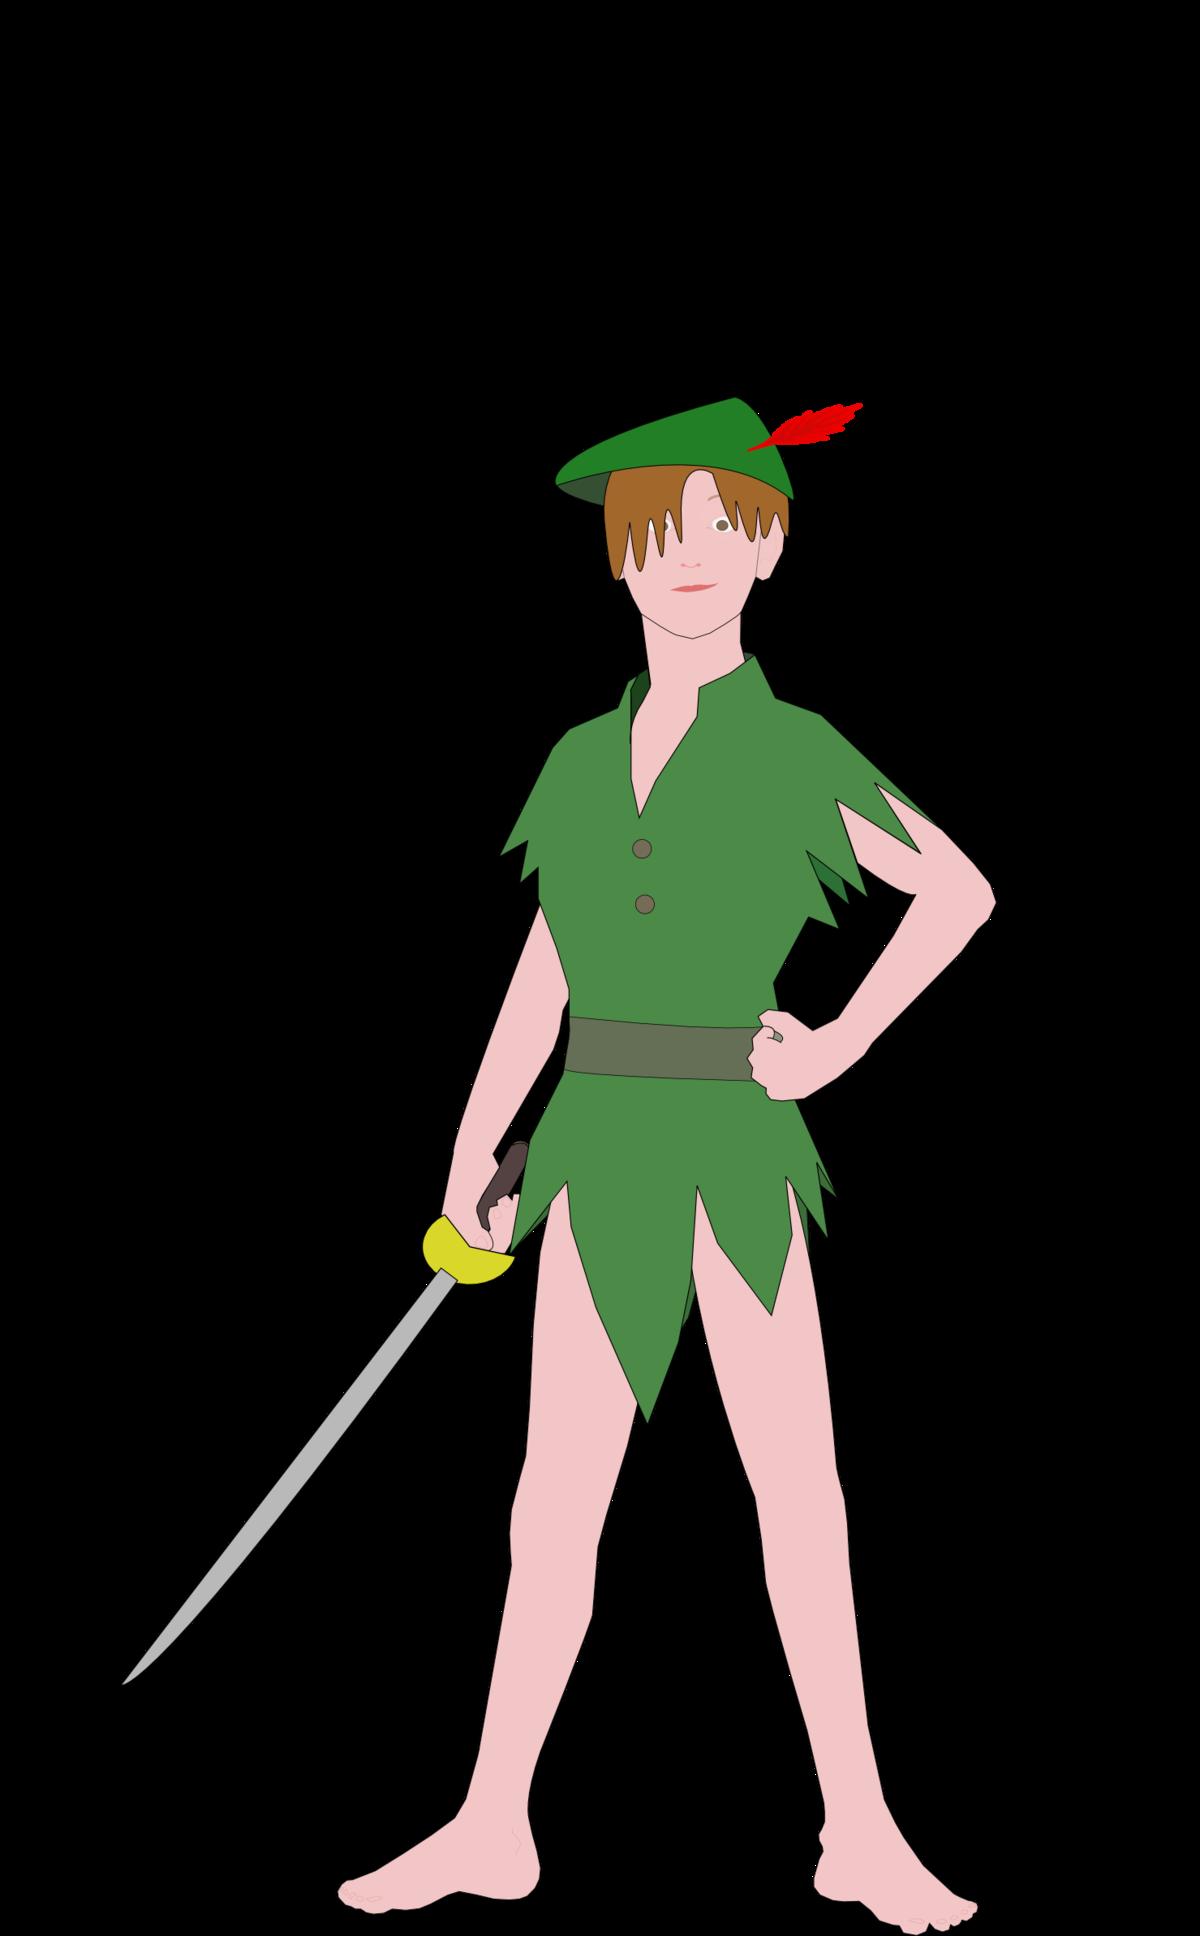 Peter pan personaggio wikiquote - Image de peter pan ...